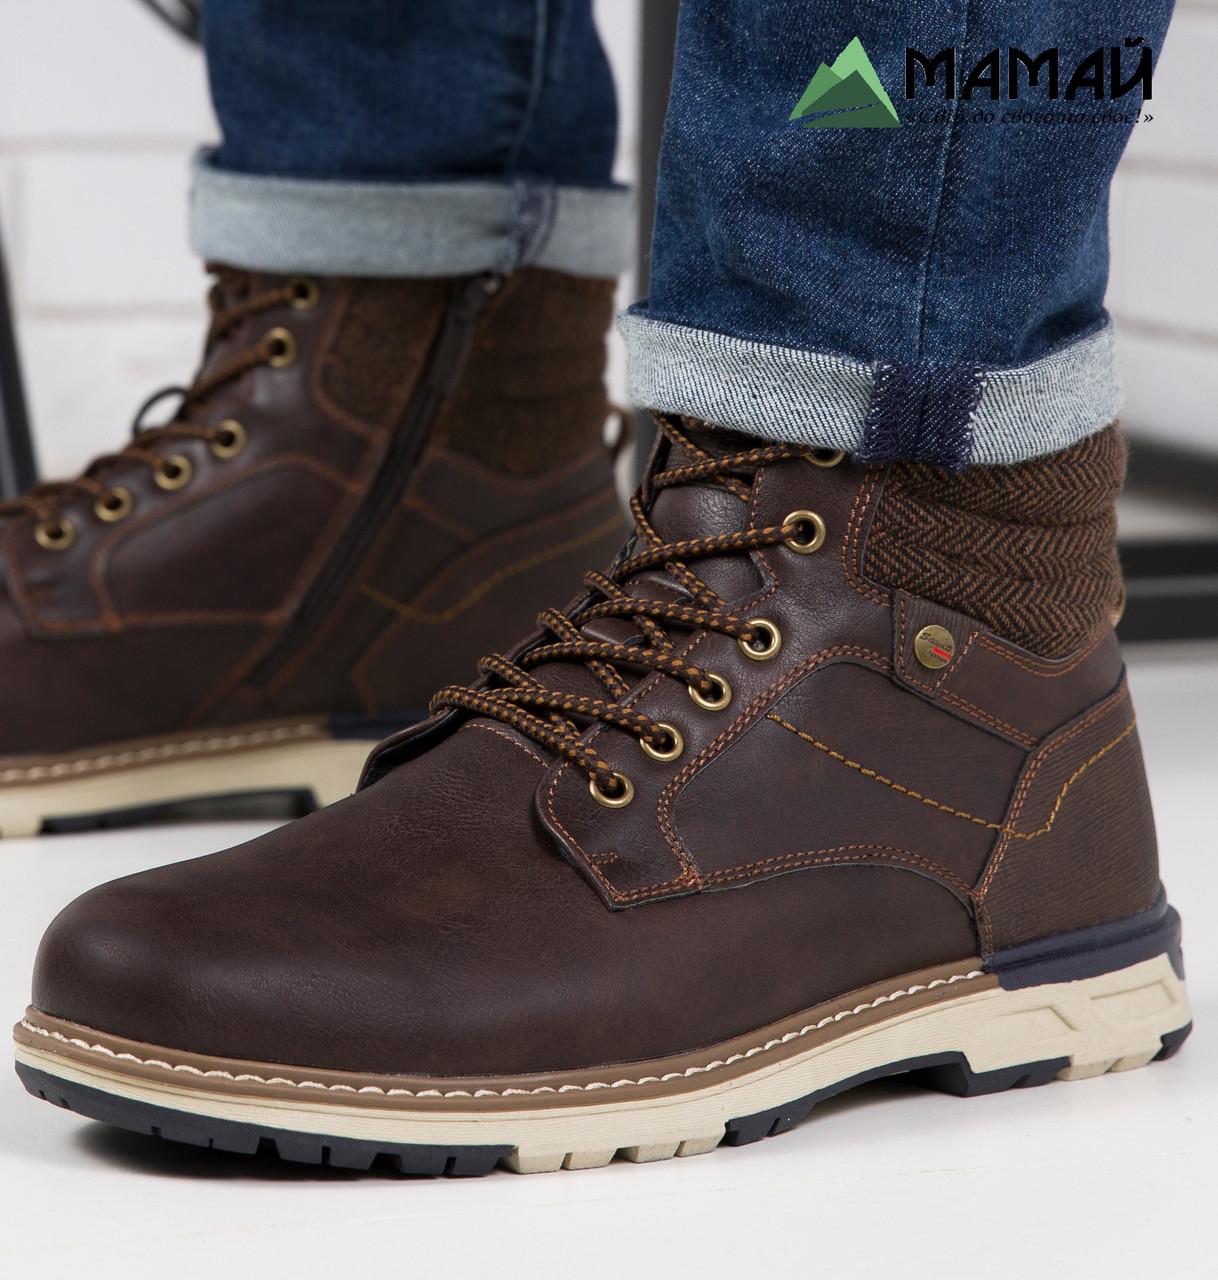 Ботинки мужские зимние -20°C 40,41р